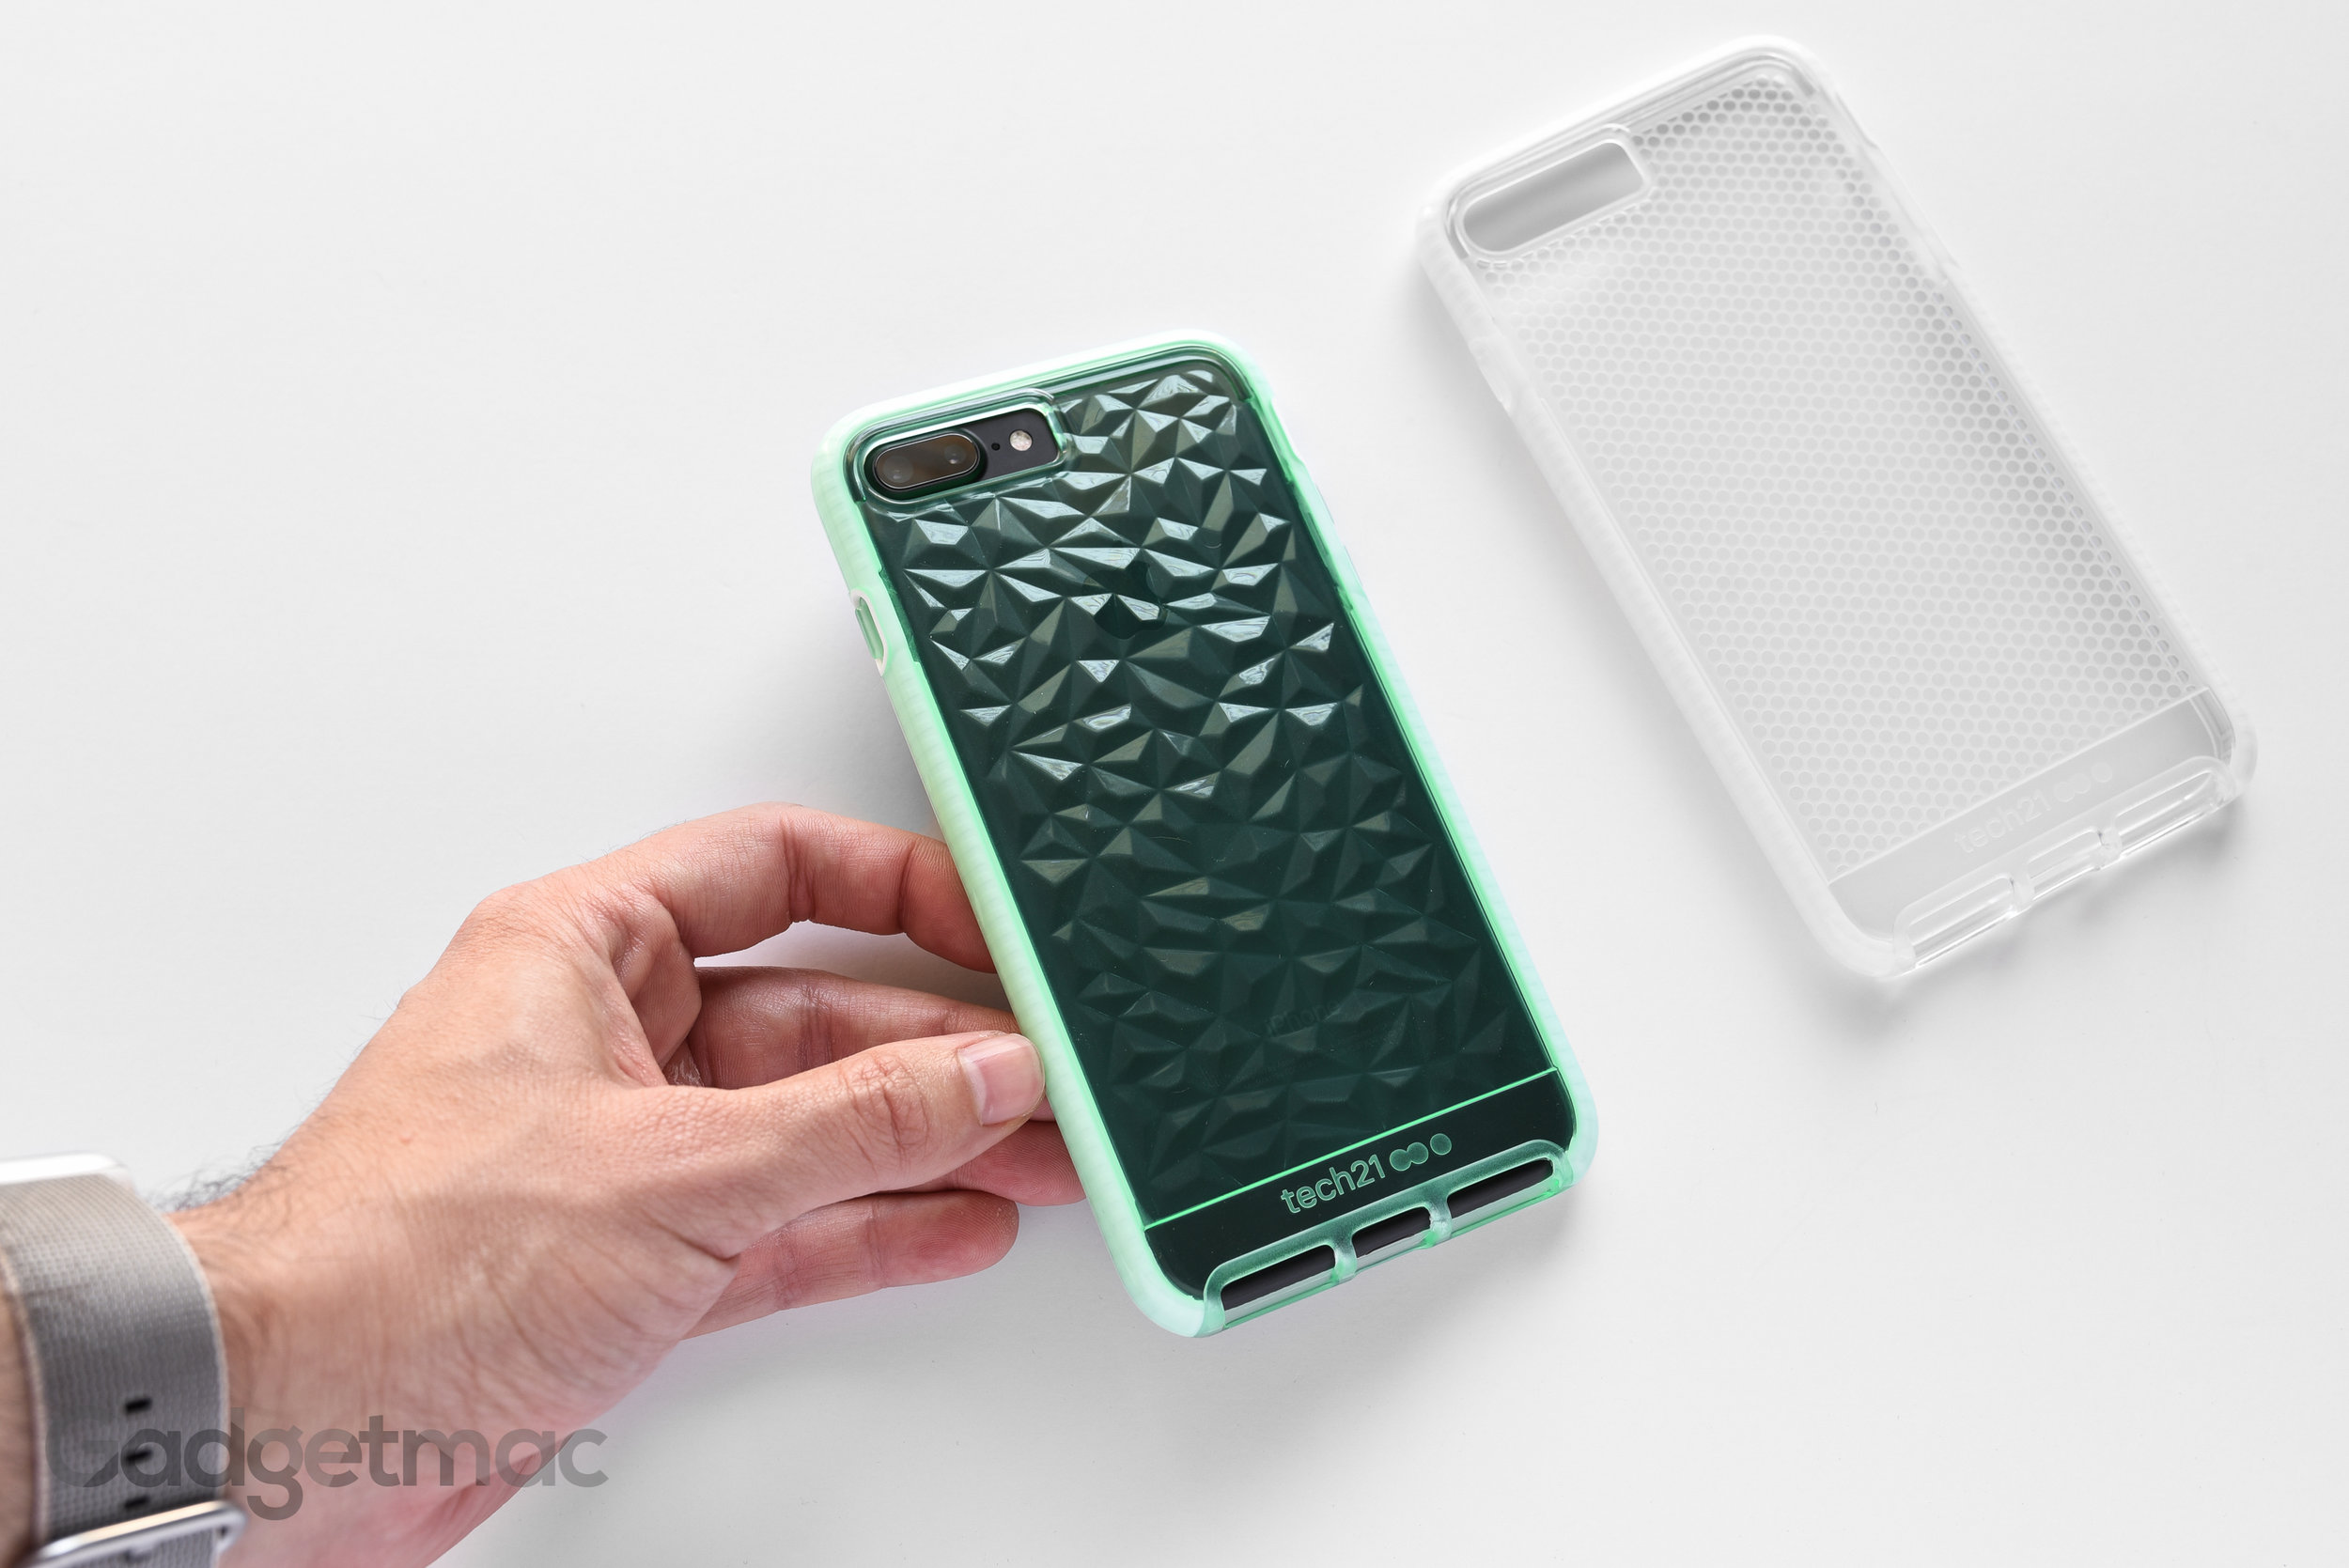 tech21-evo-gem-iphone-7-plus-case.jpg